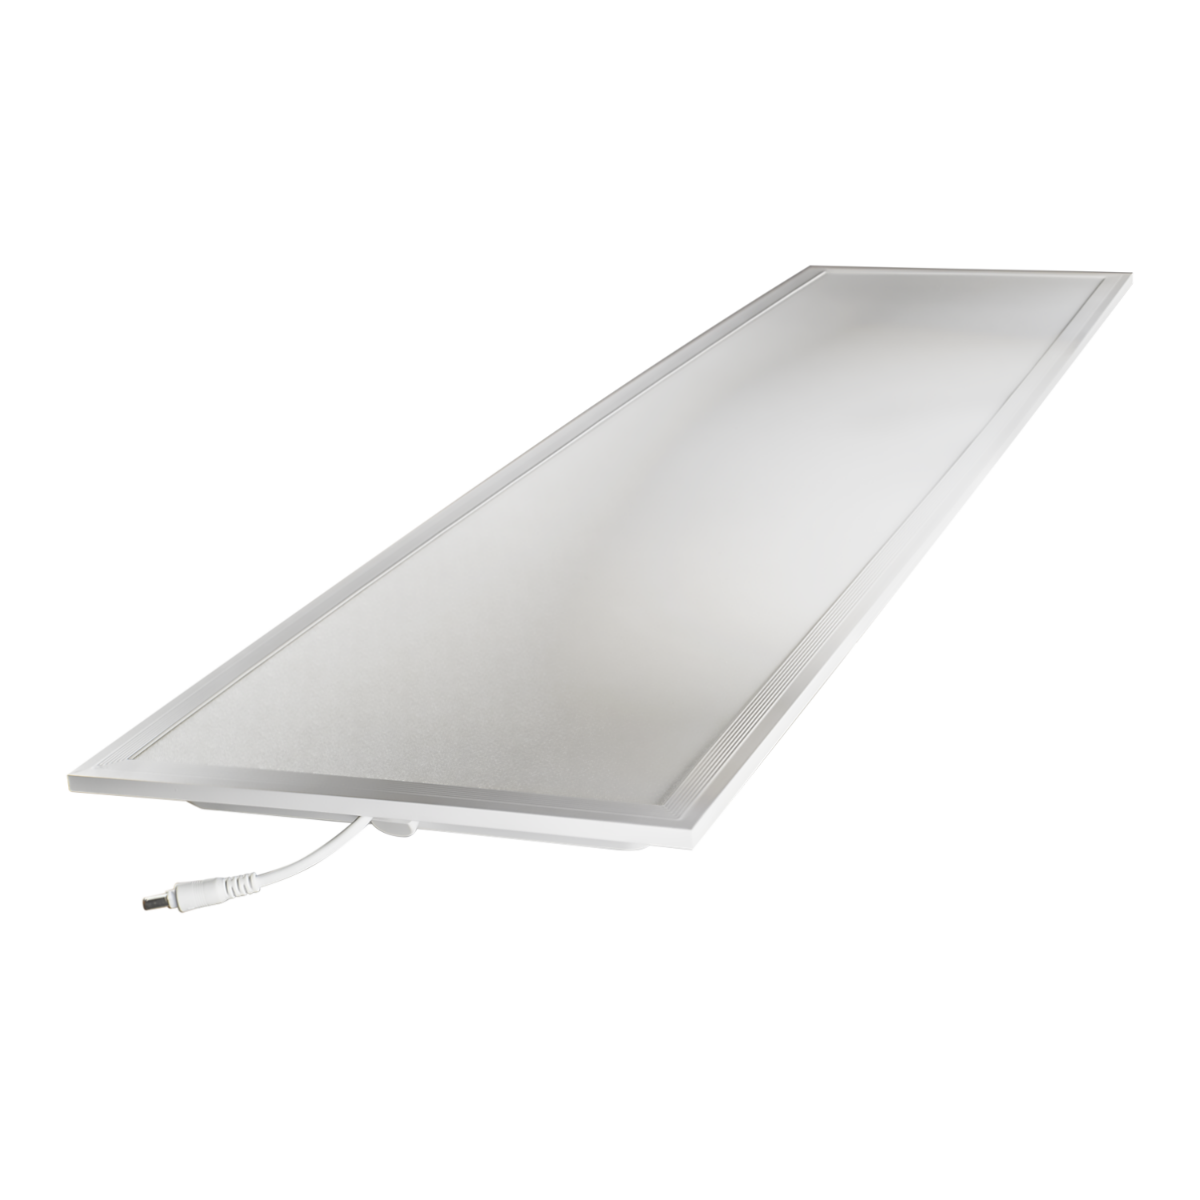 Noxion LED Paneel Delta Pro V2.0 Xitanium DALI 30W 30x120cm 6500K 4110lm UGR <19   Dali Dimbaar - Daglicht - Vervangt 2x36W